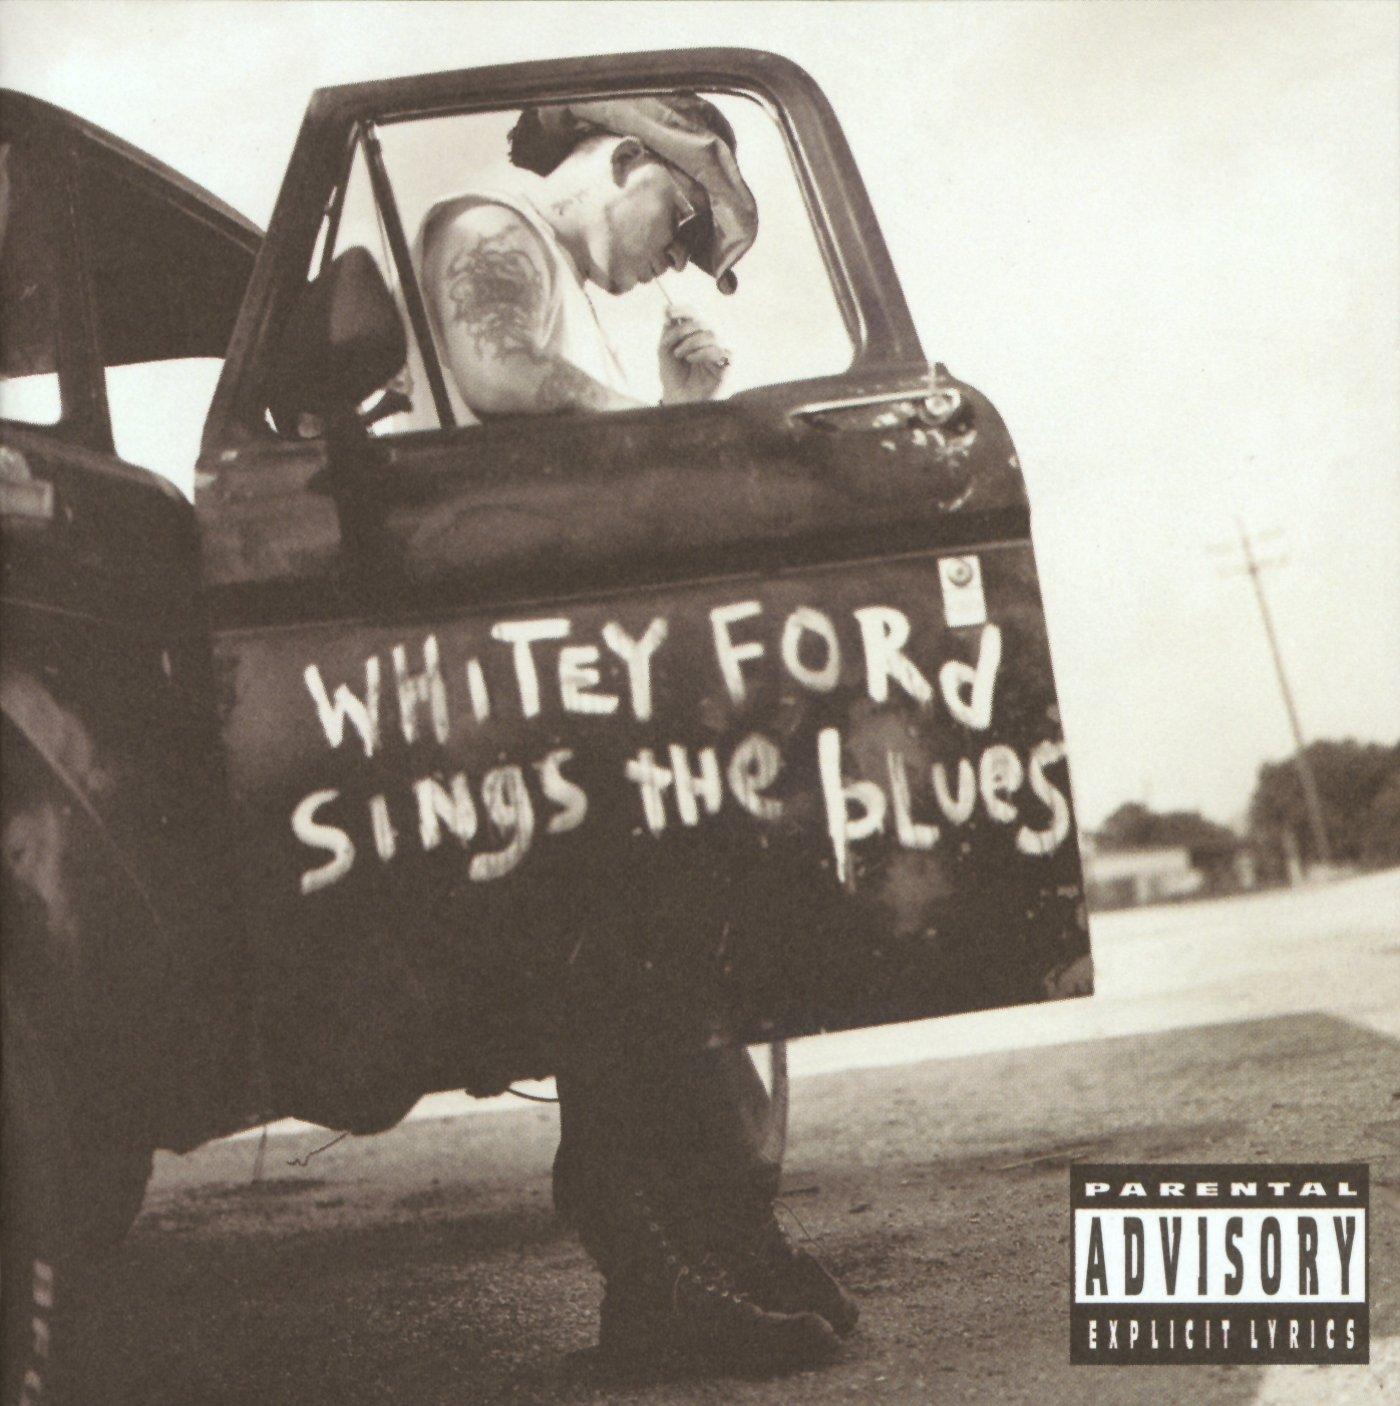 Verkooppromotie gloednieuw uitverkoop Whitey Ford Sings the Blues Explicit Lyrics